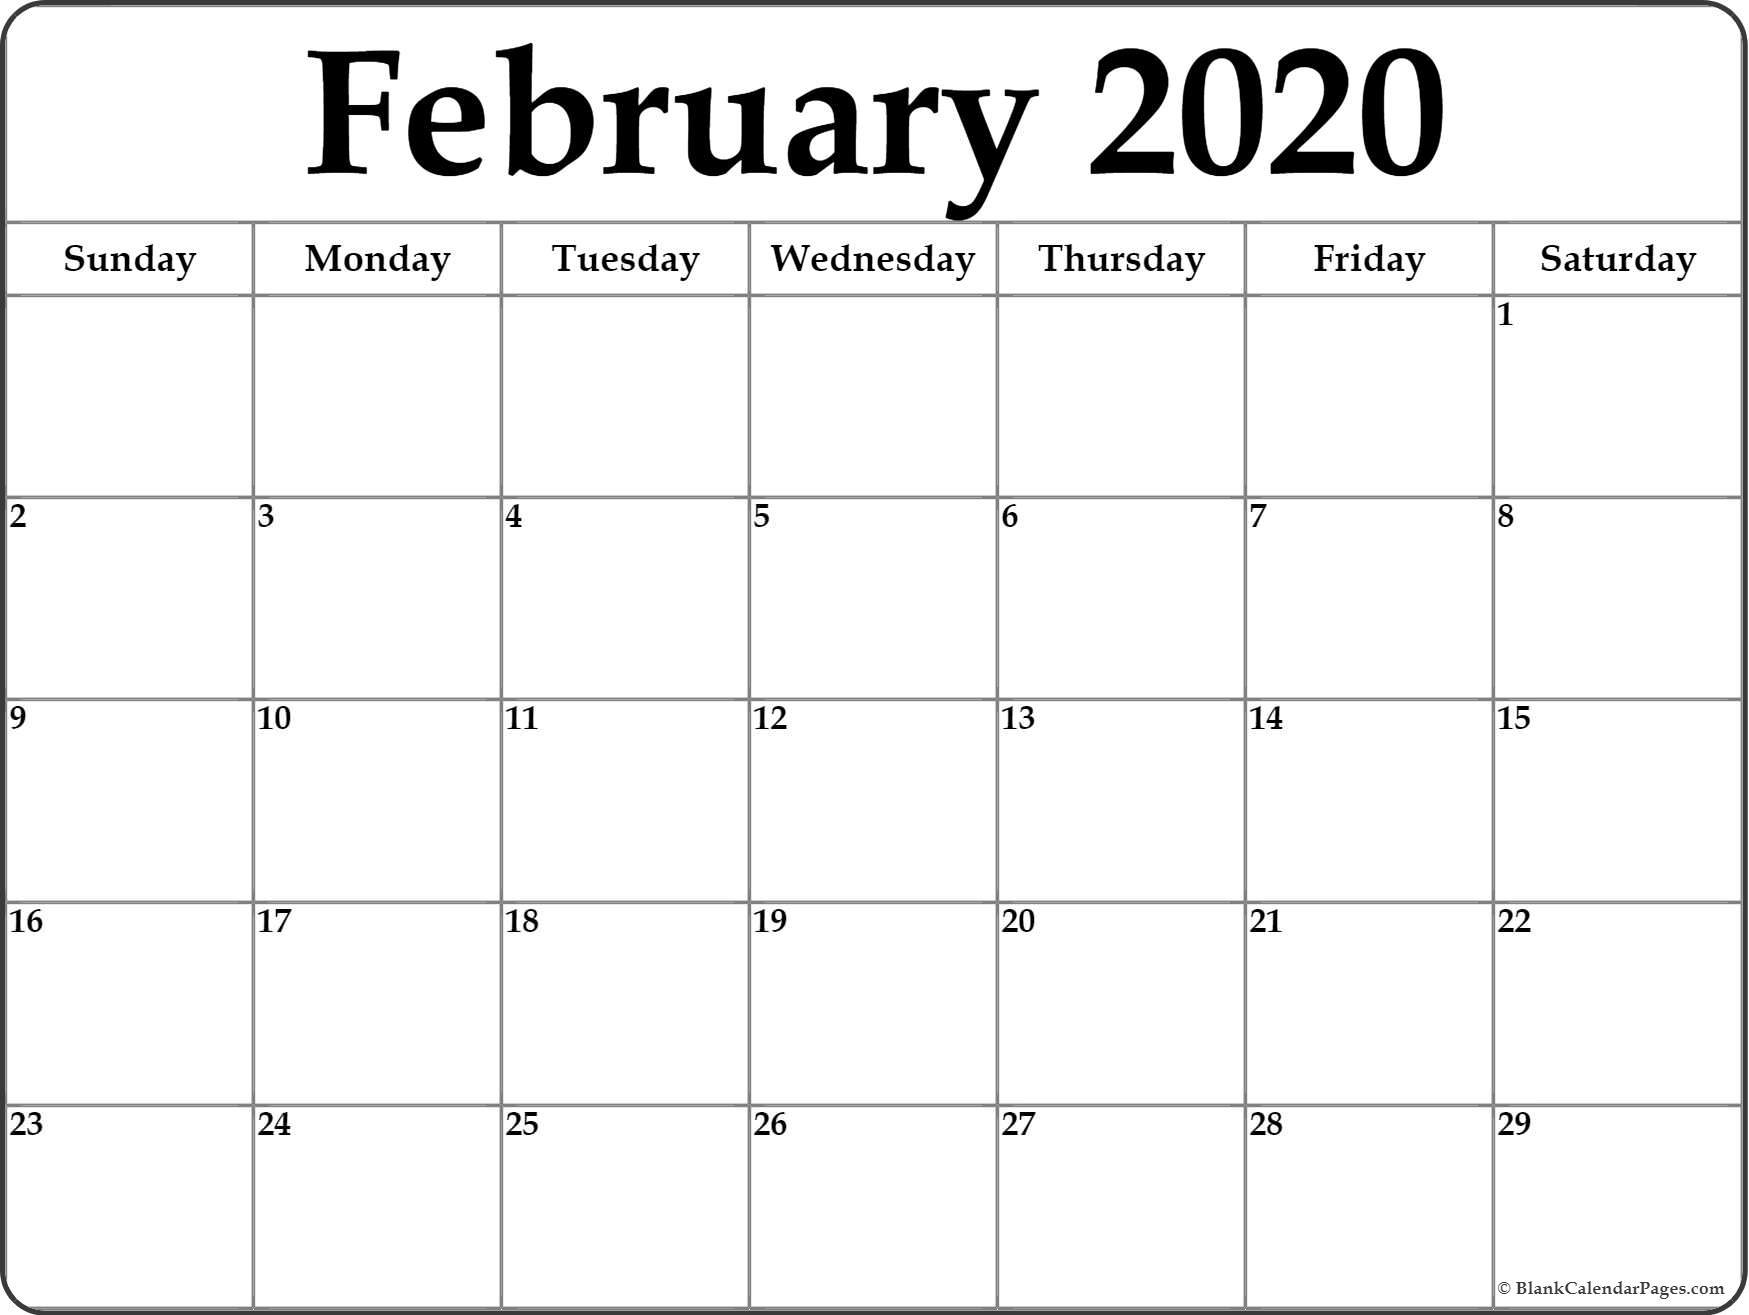 February 2020 Calendar   Free Printable Monthly Calendars